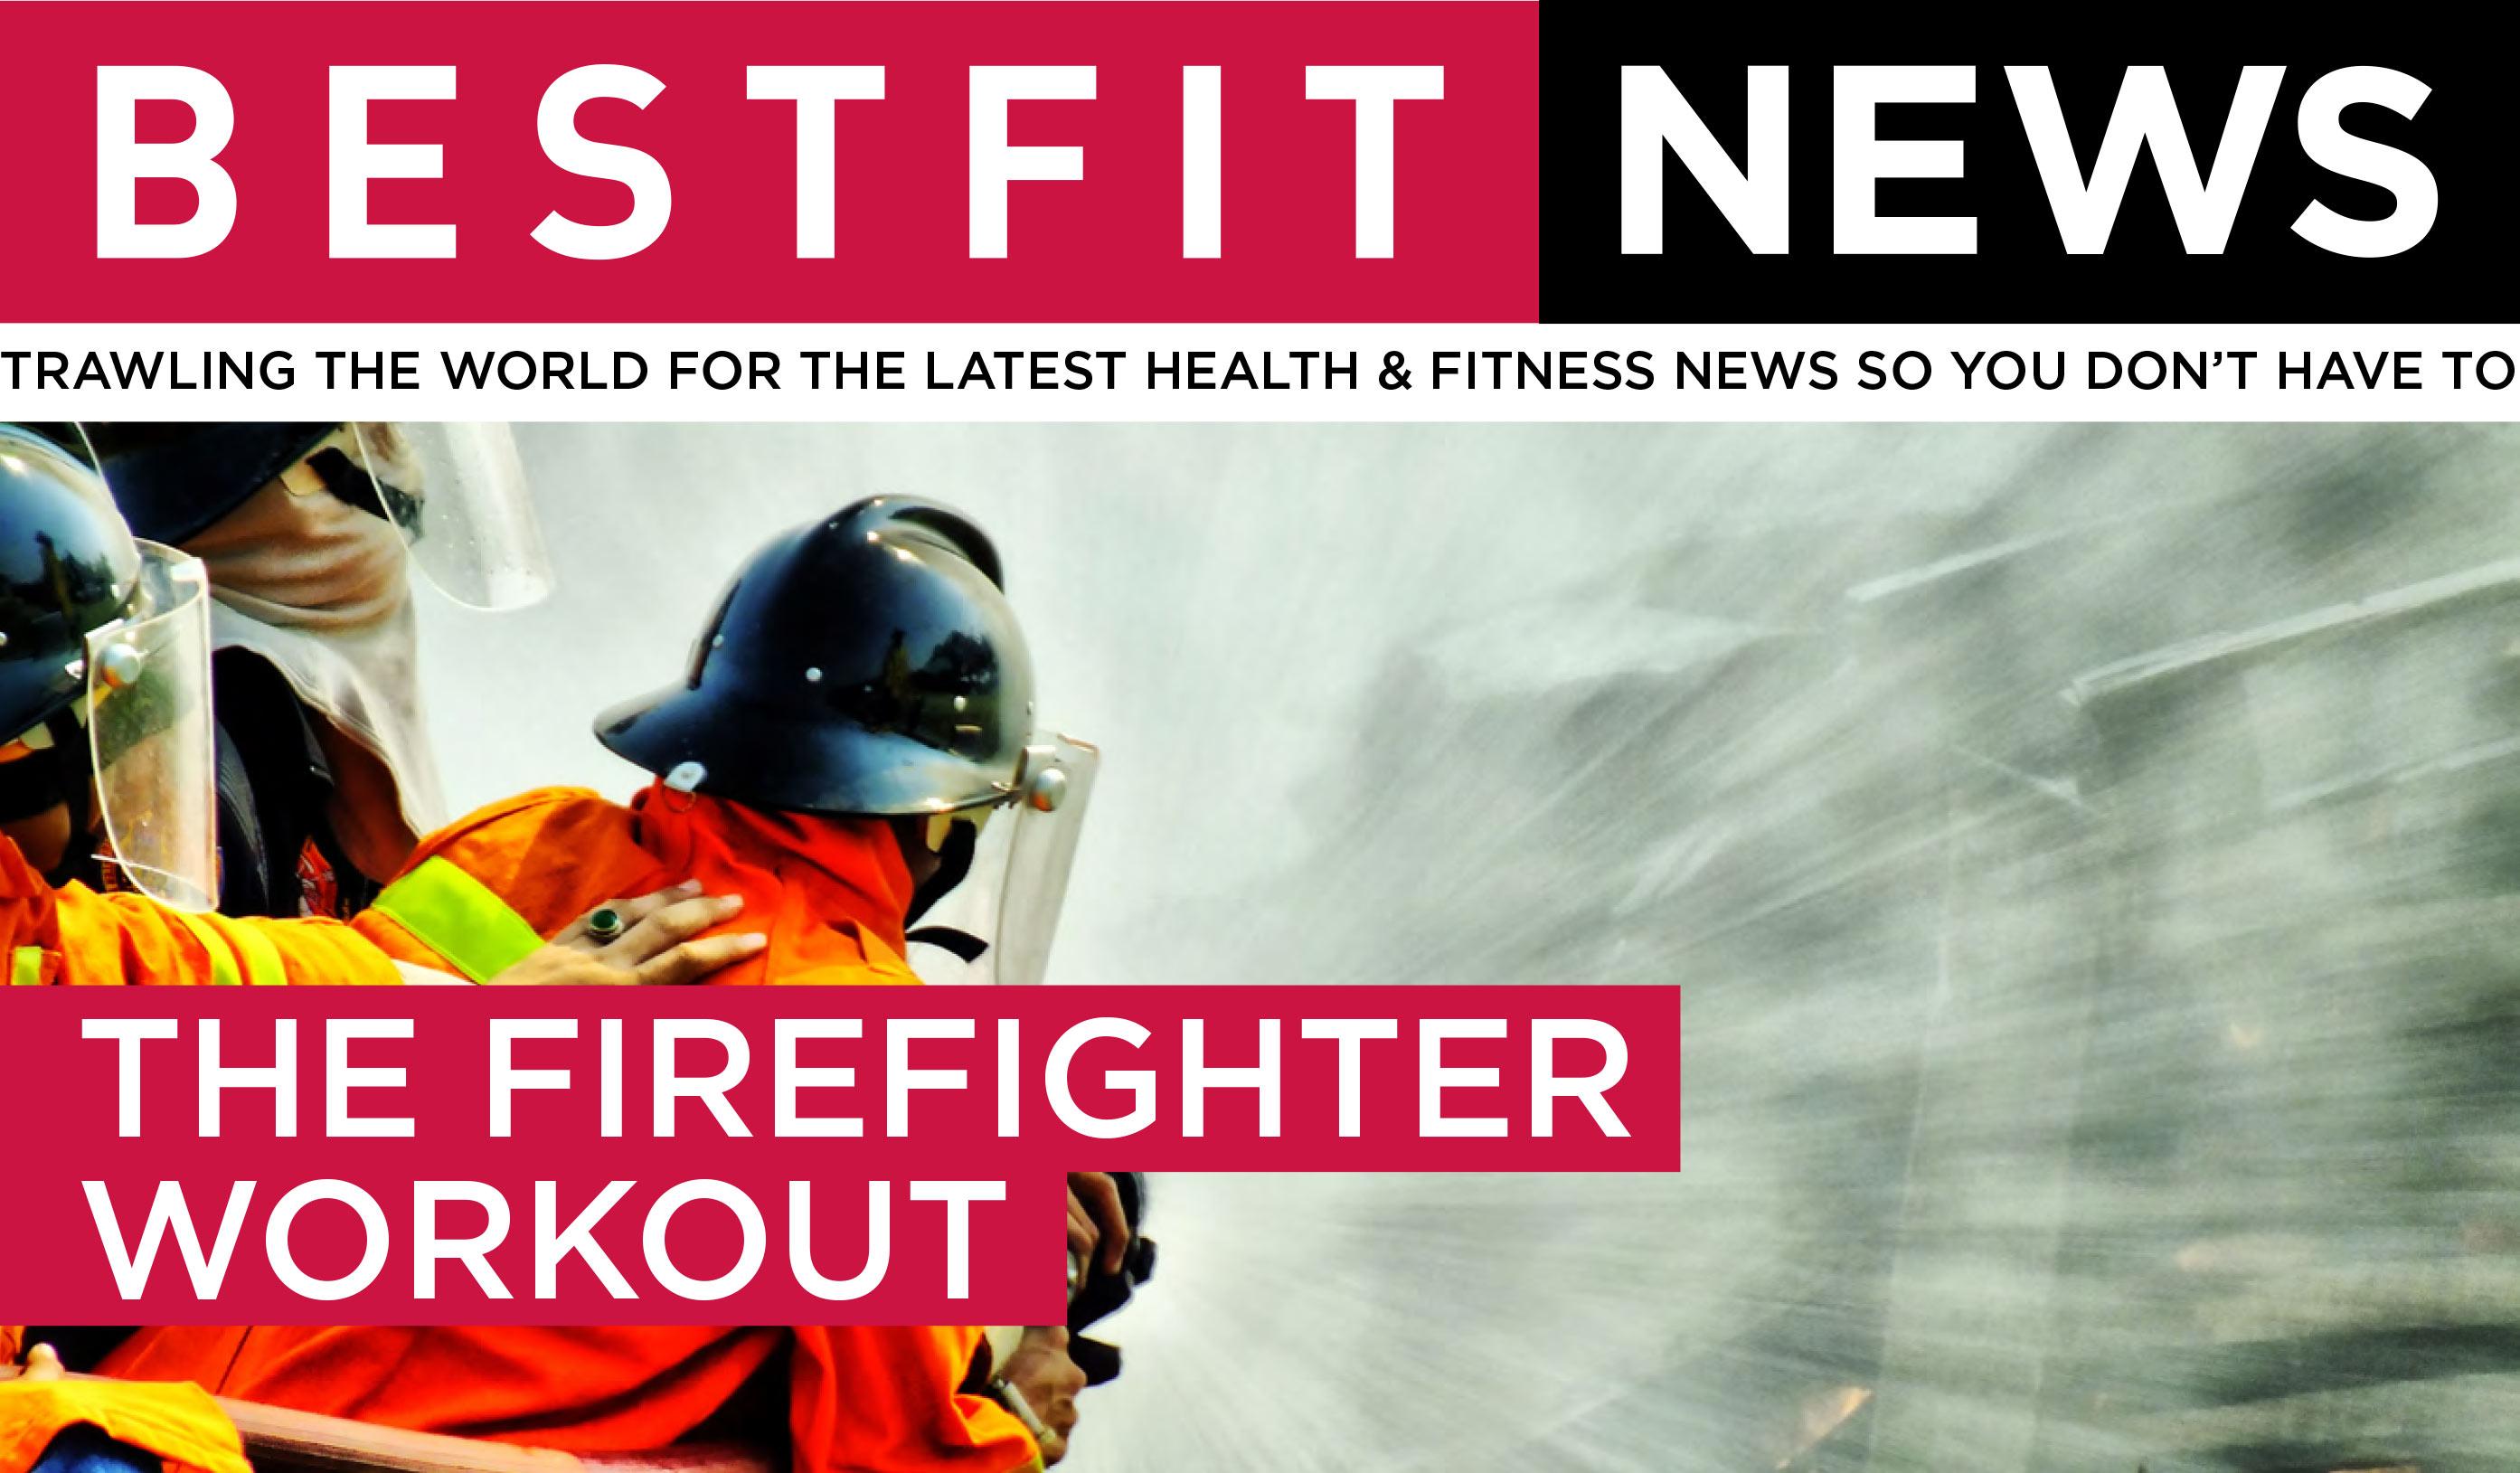 News-header-issue11